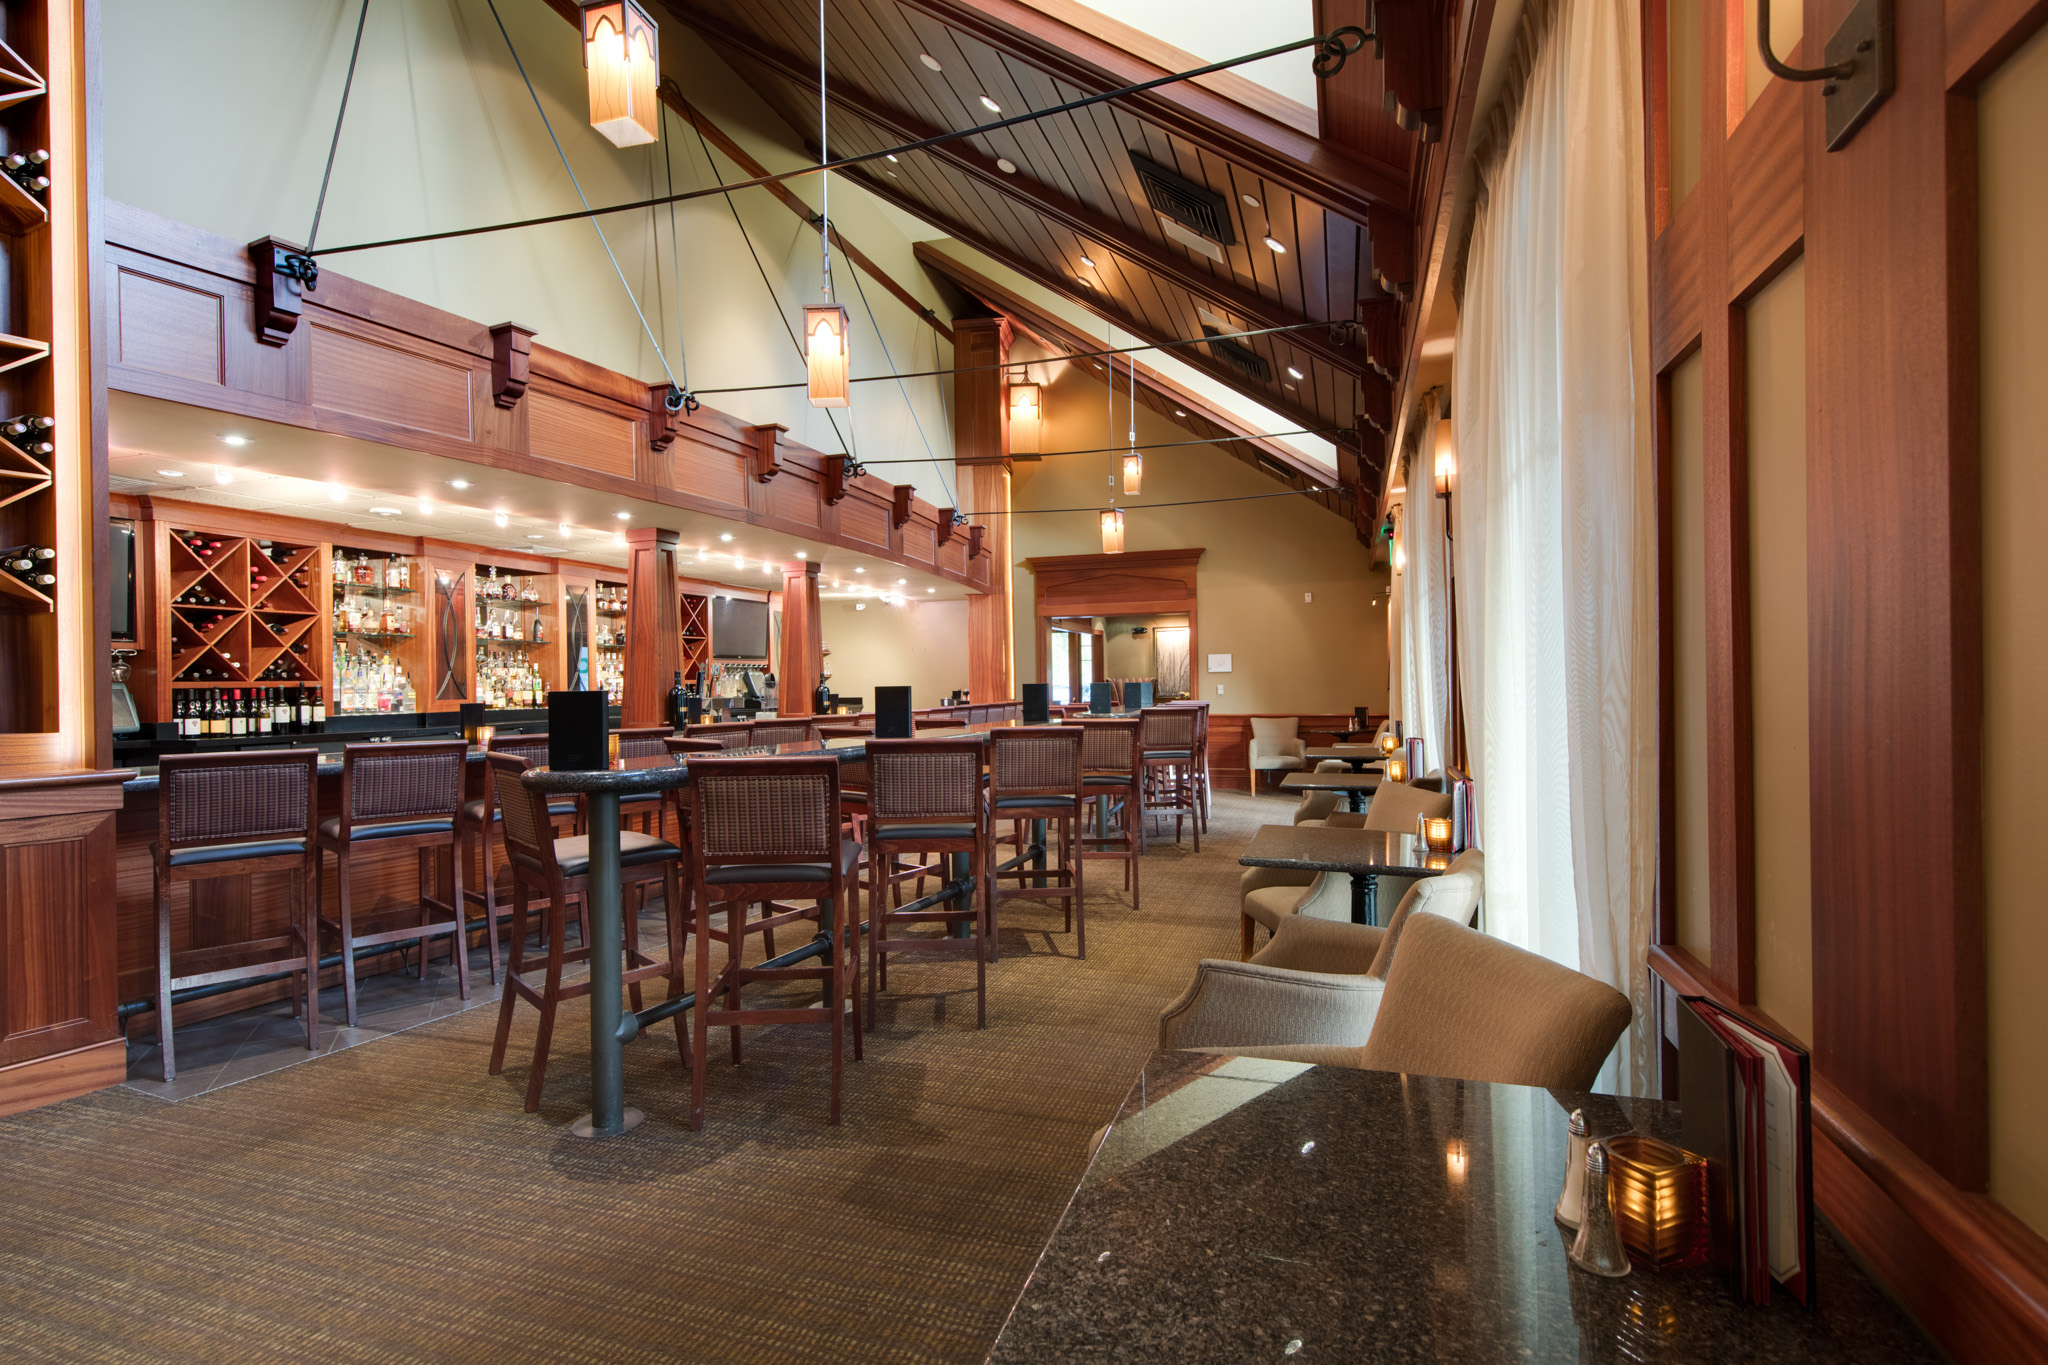 Ruth's Chris Steak House - Bar Seating